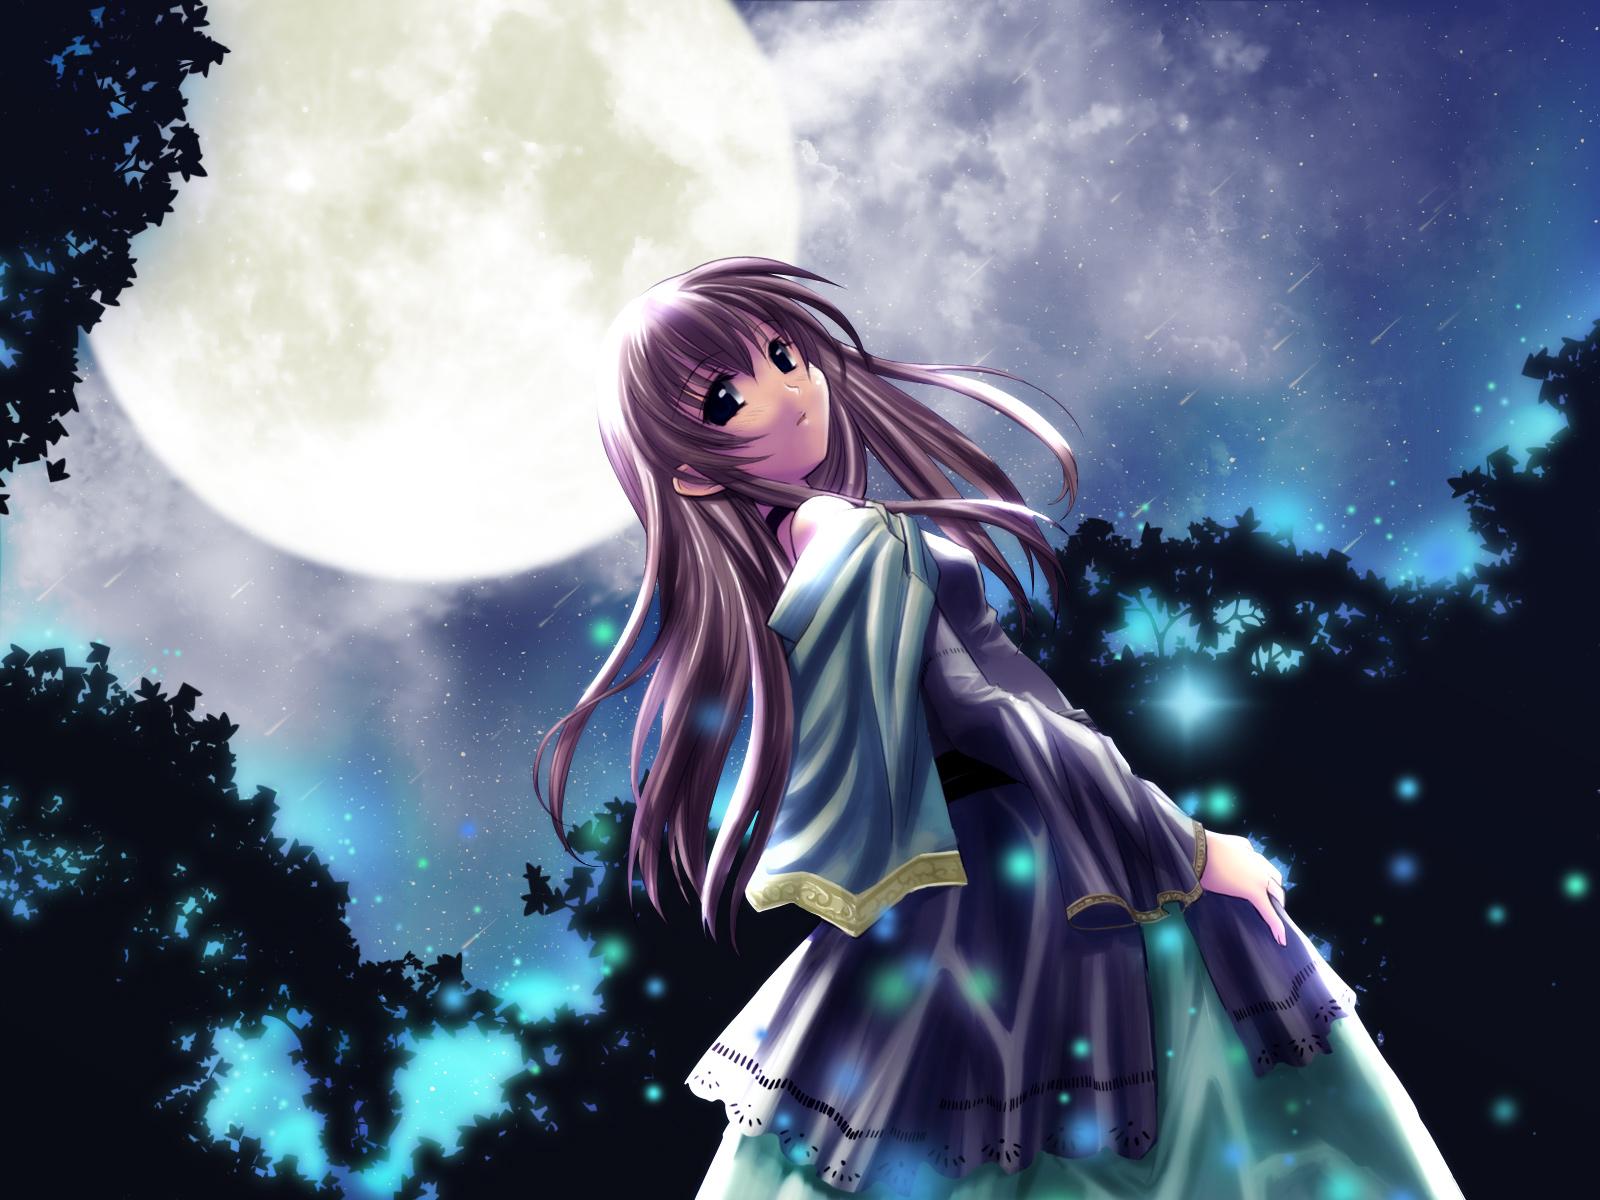 Moonlight Walker Wallpaper And Background Image